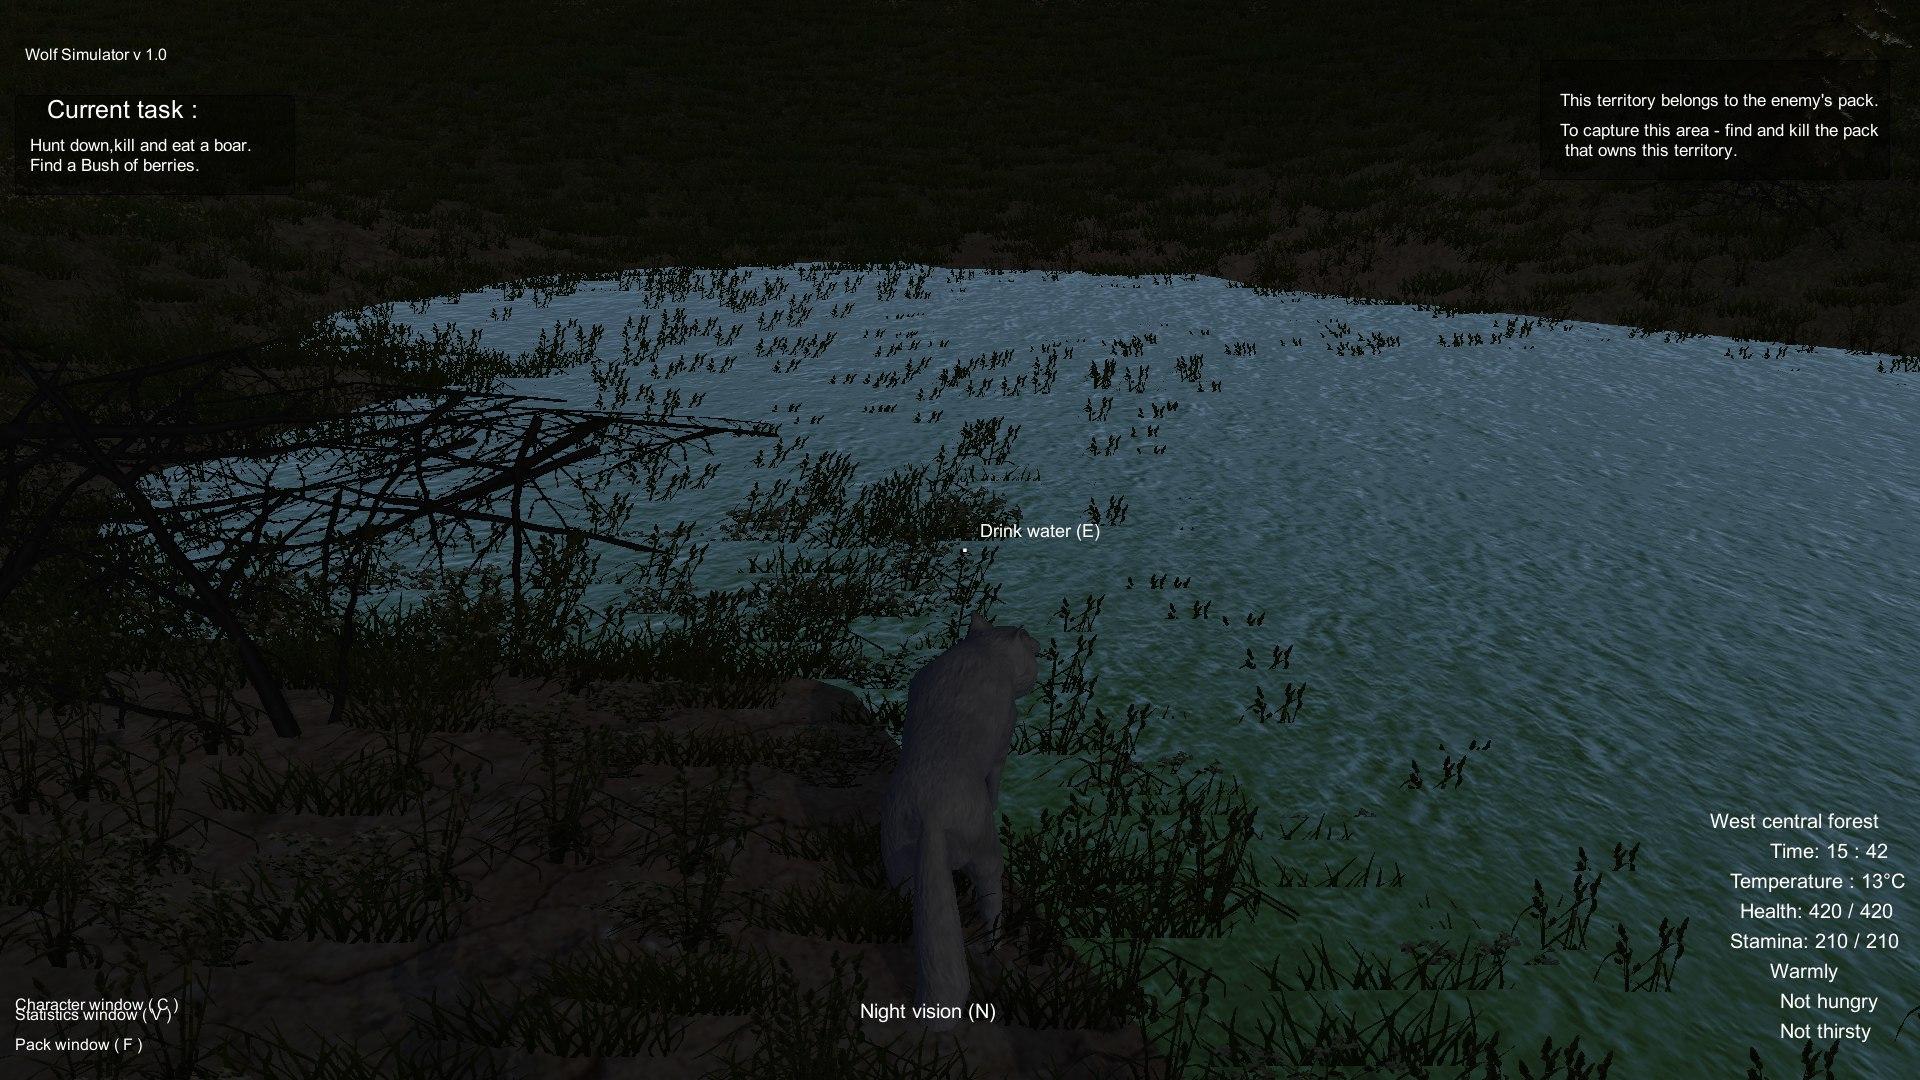 Wolf Simulator Screenshot 2